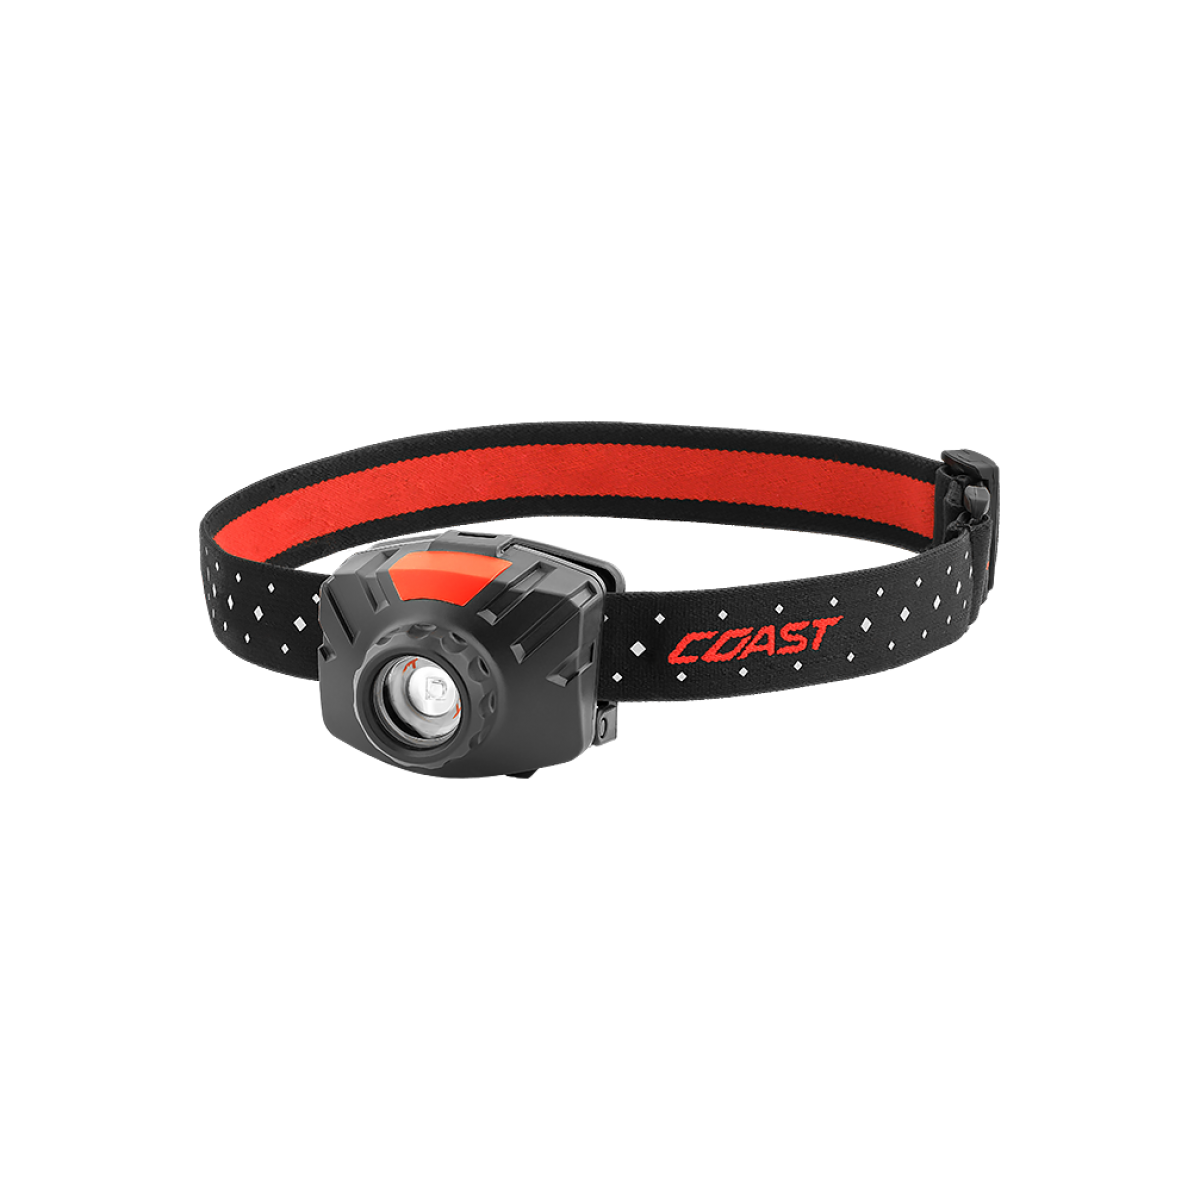 Coast FL60 LED Pandelampe-31